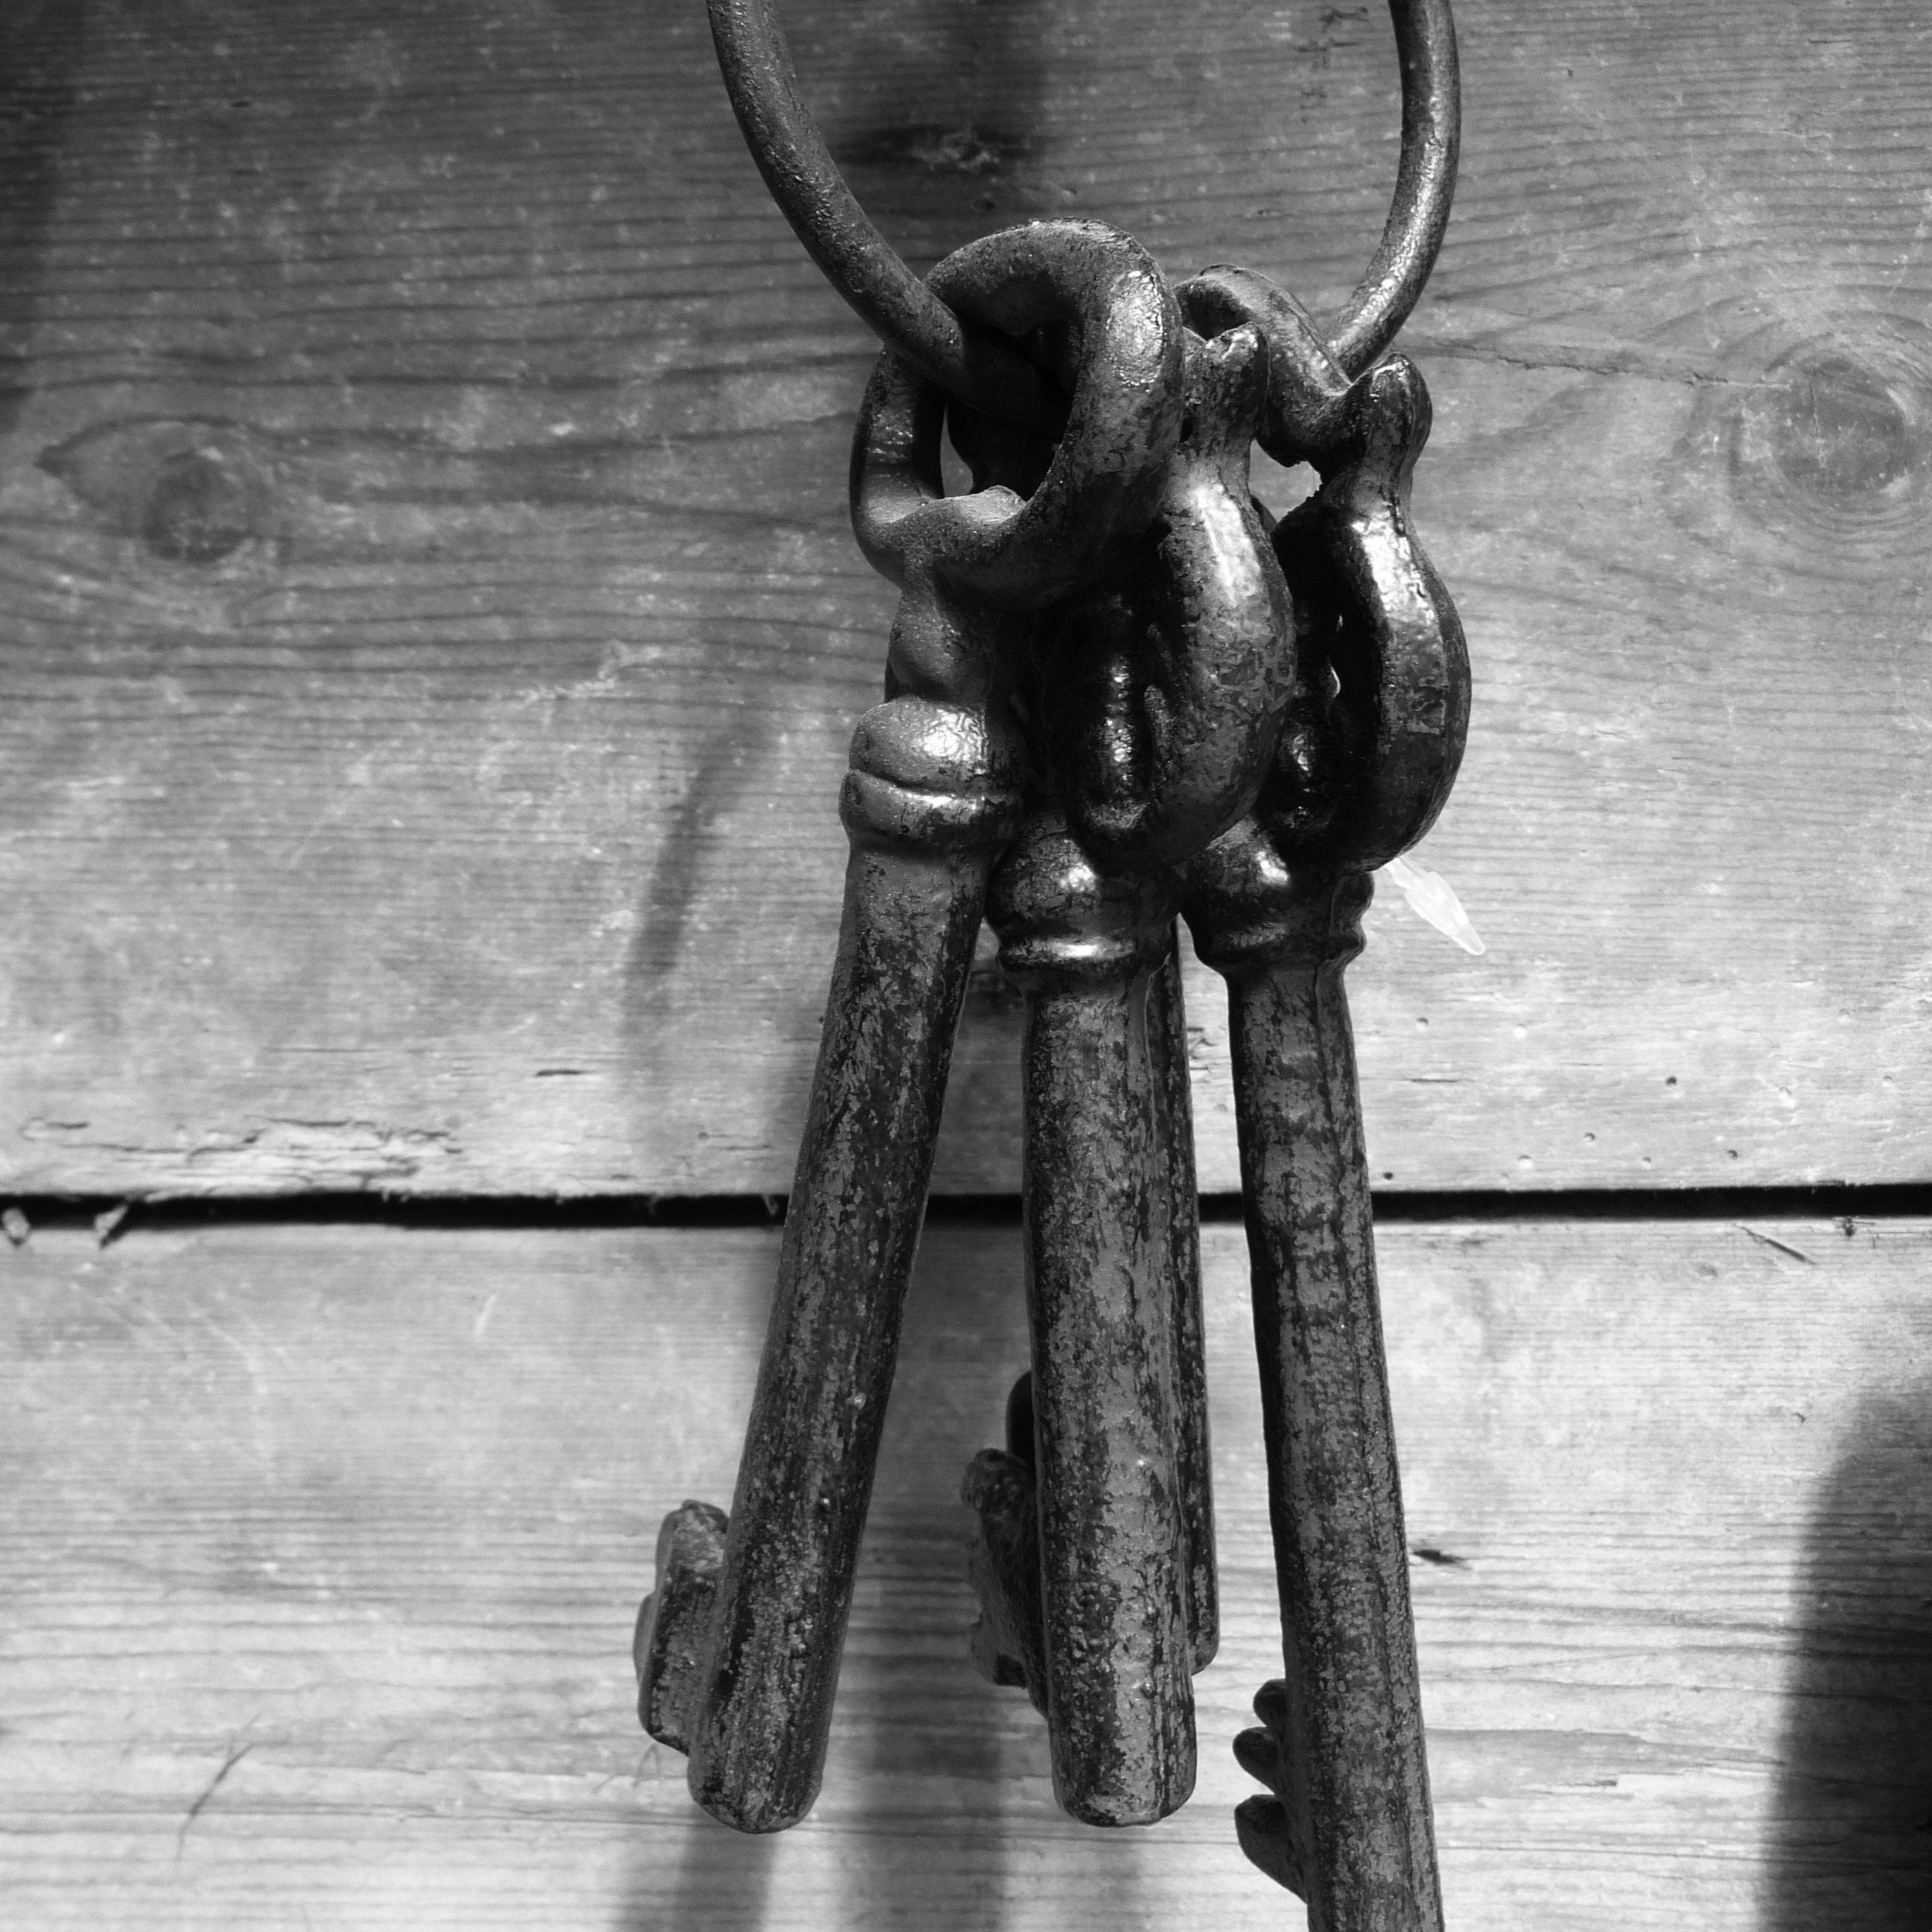 key-123554.jpg